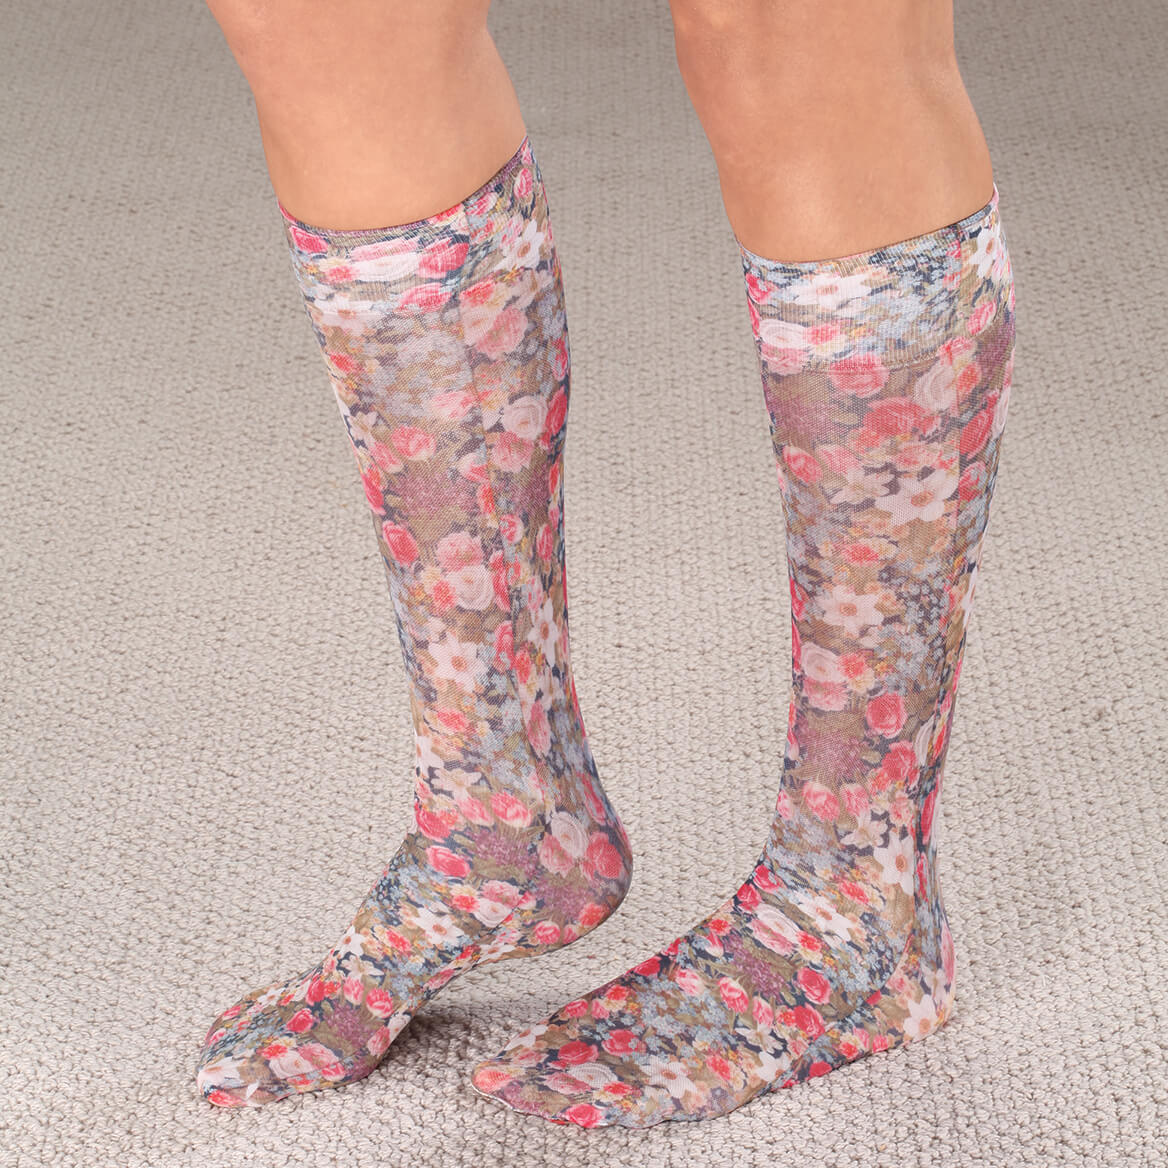 a213fb30db Celeste Stein Compression Socks, 15-20 mmHg - Miles Kimball